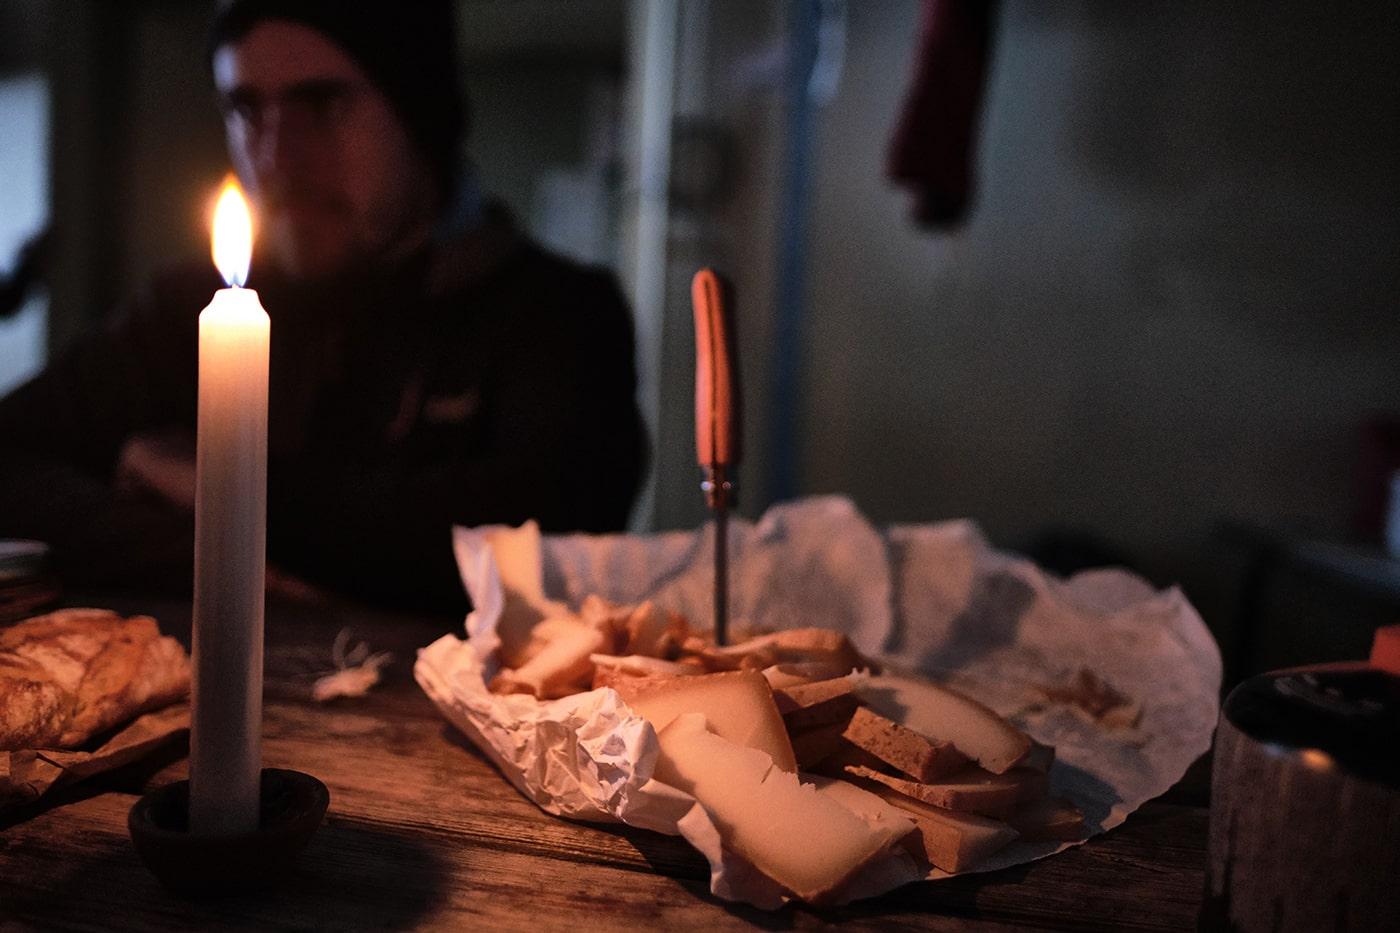 Fromage et bougie dans le refuge